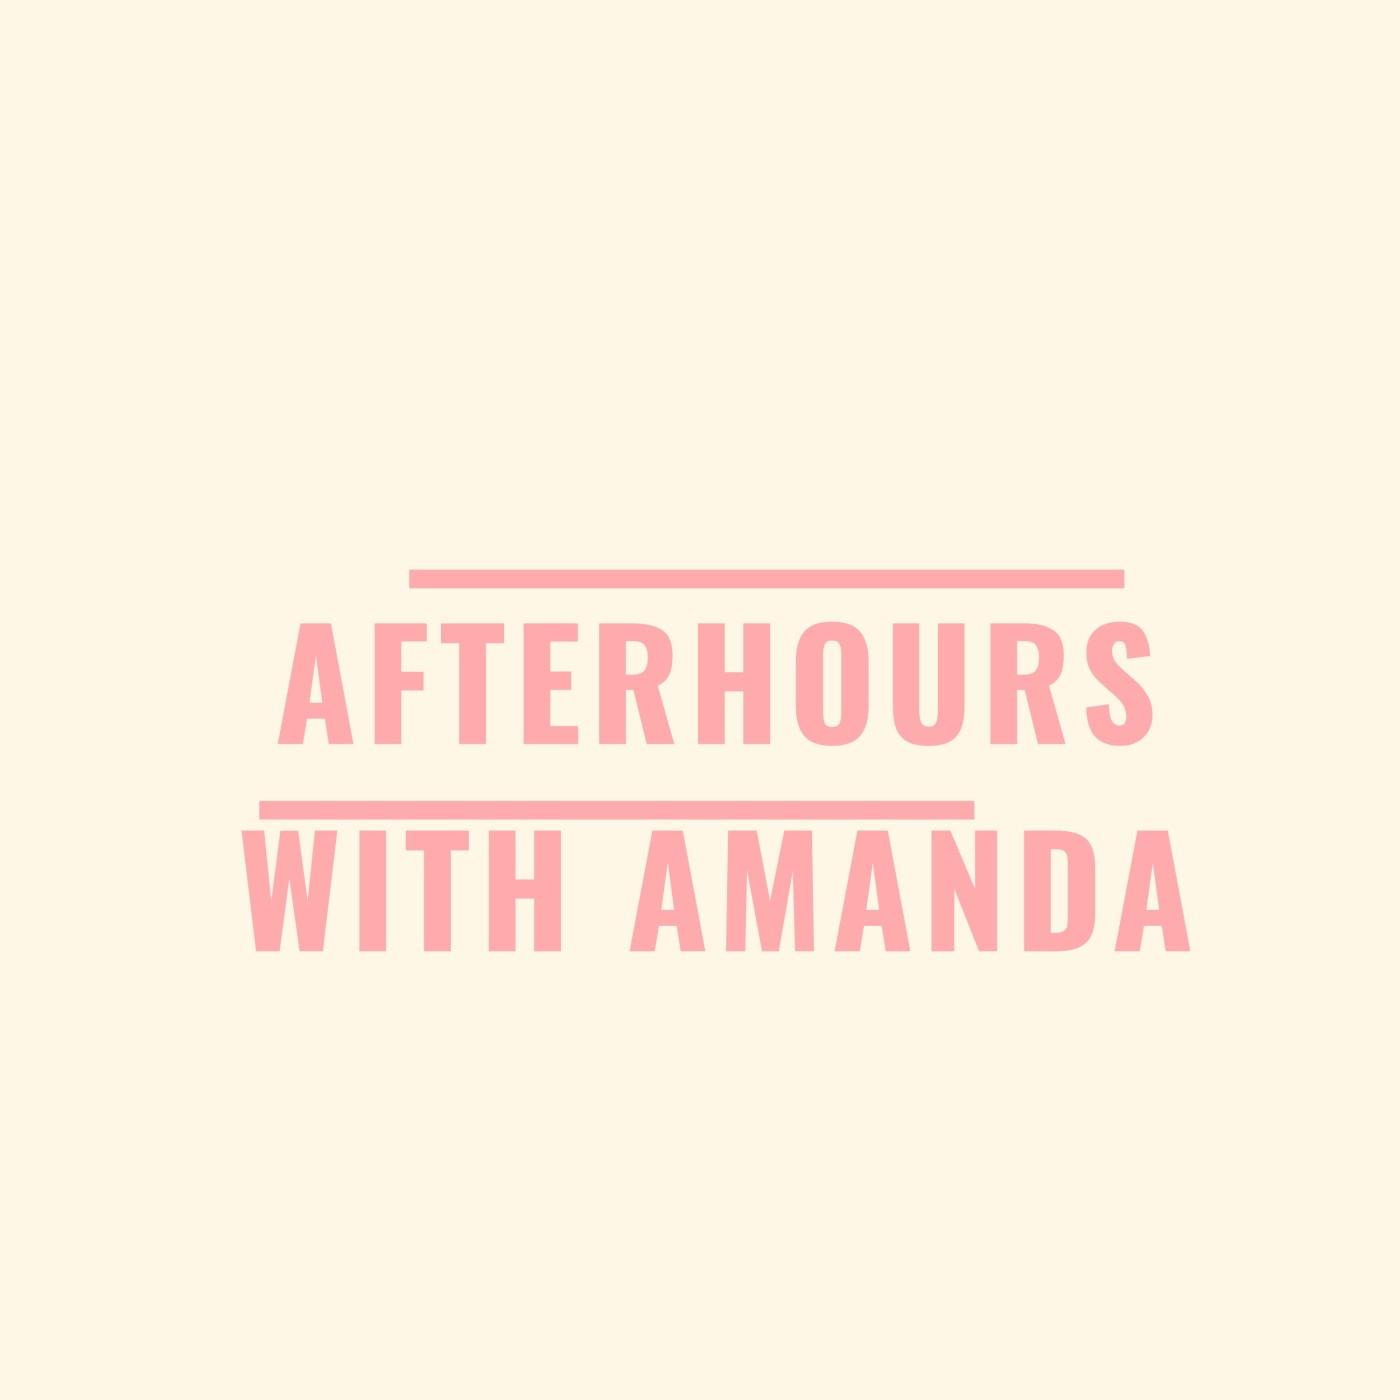 AfterHoursWithAmanda Episode 1: Where do we begin?